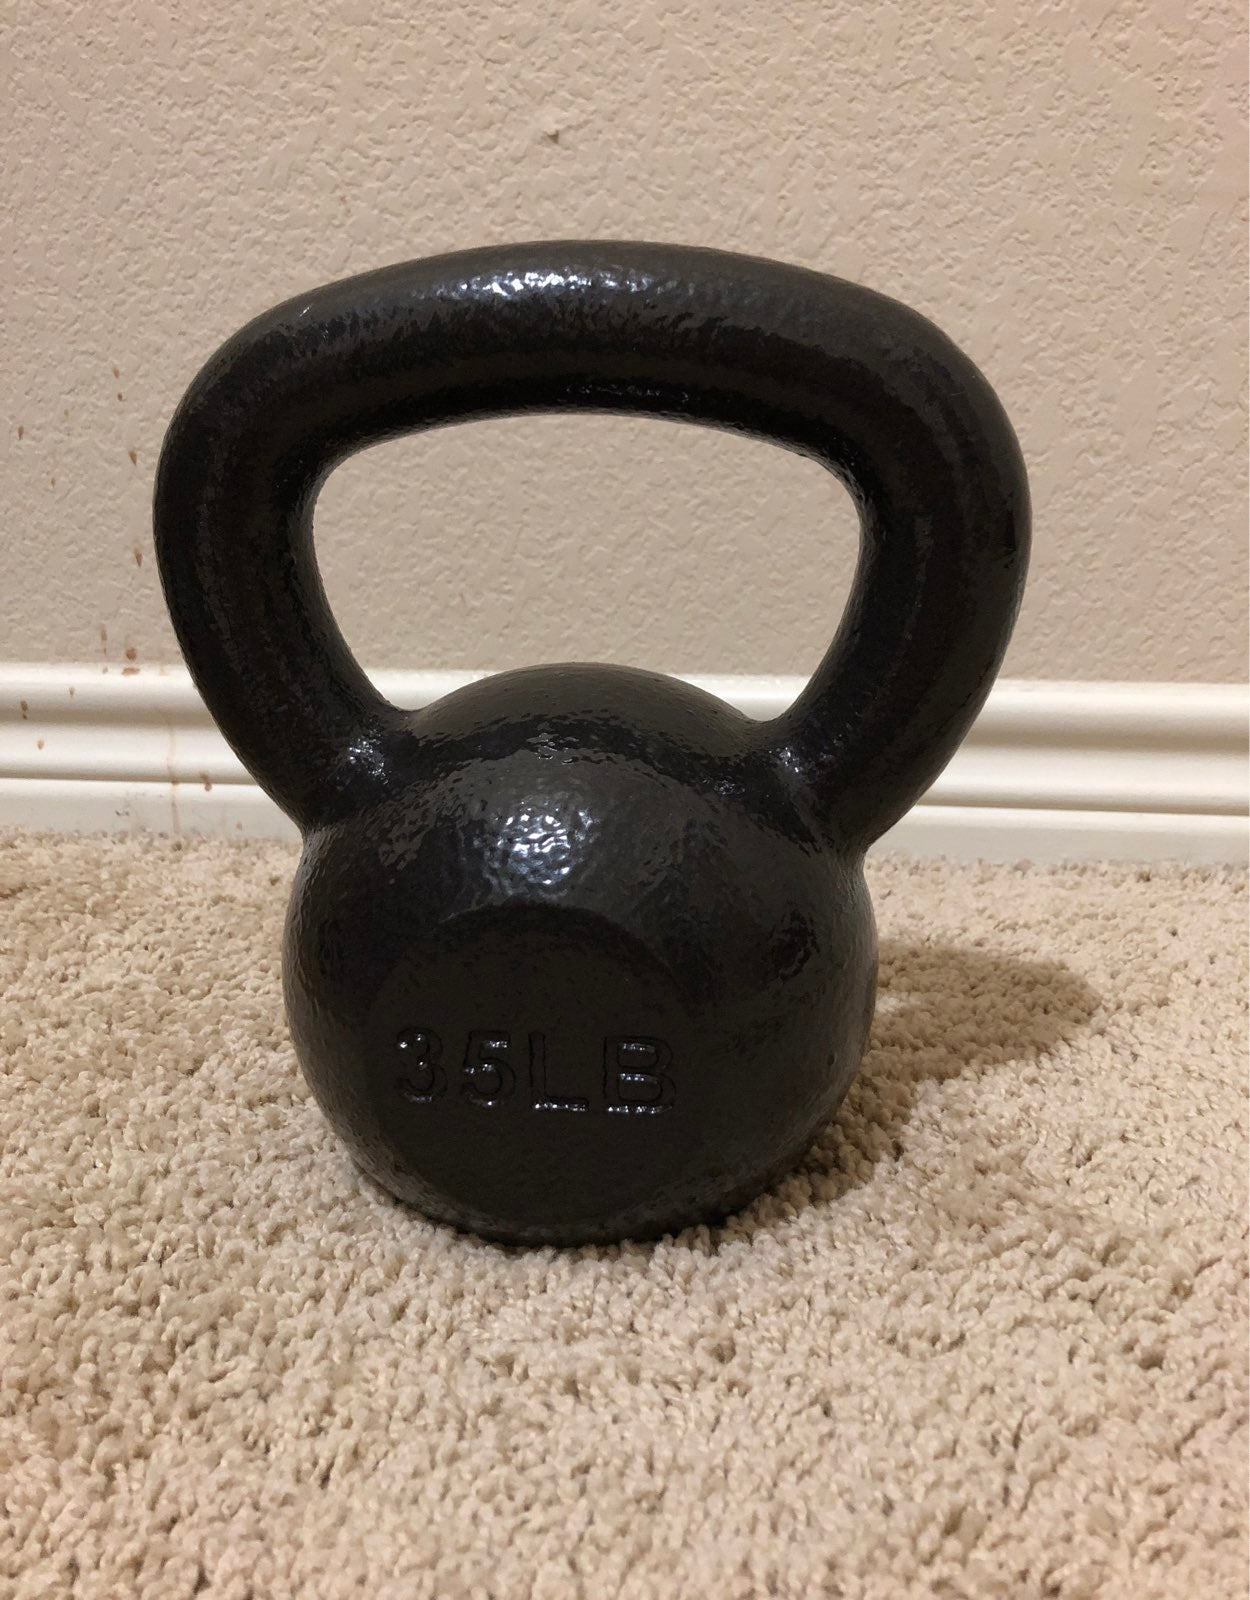 35 pound kettlebell